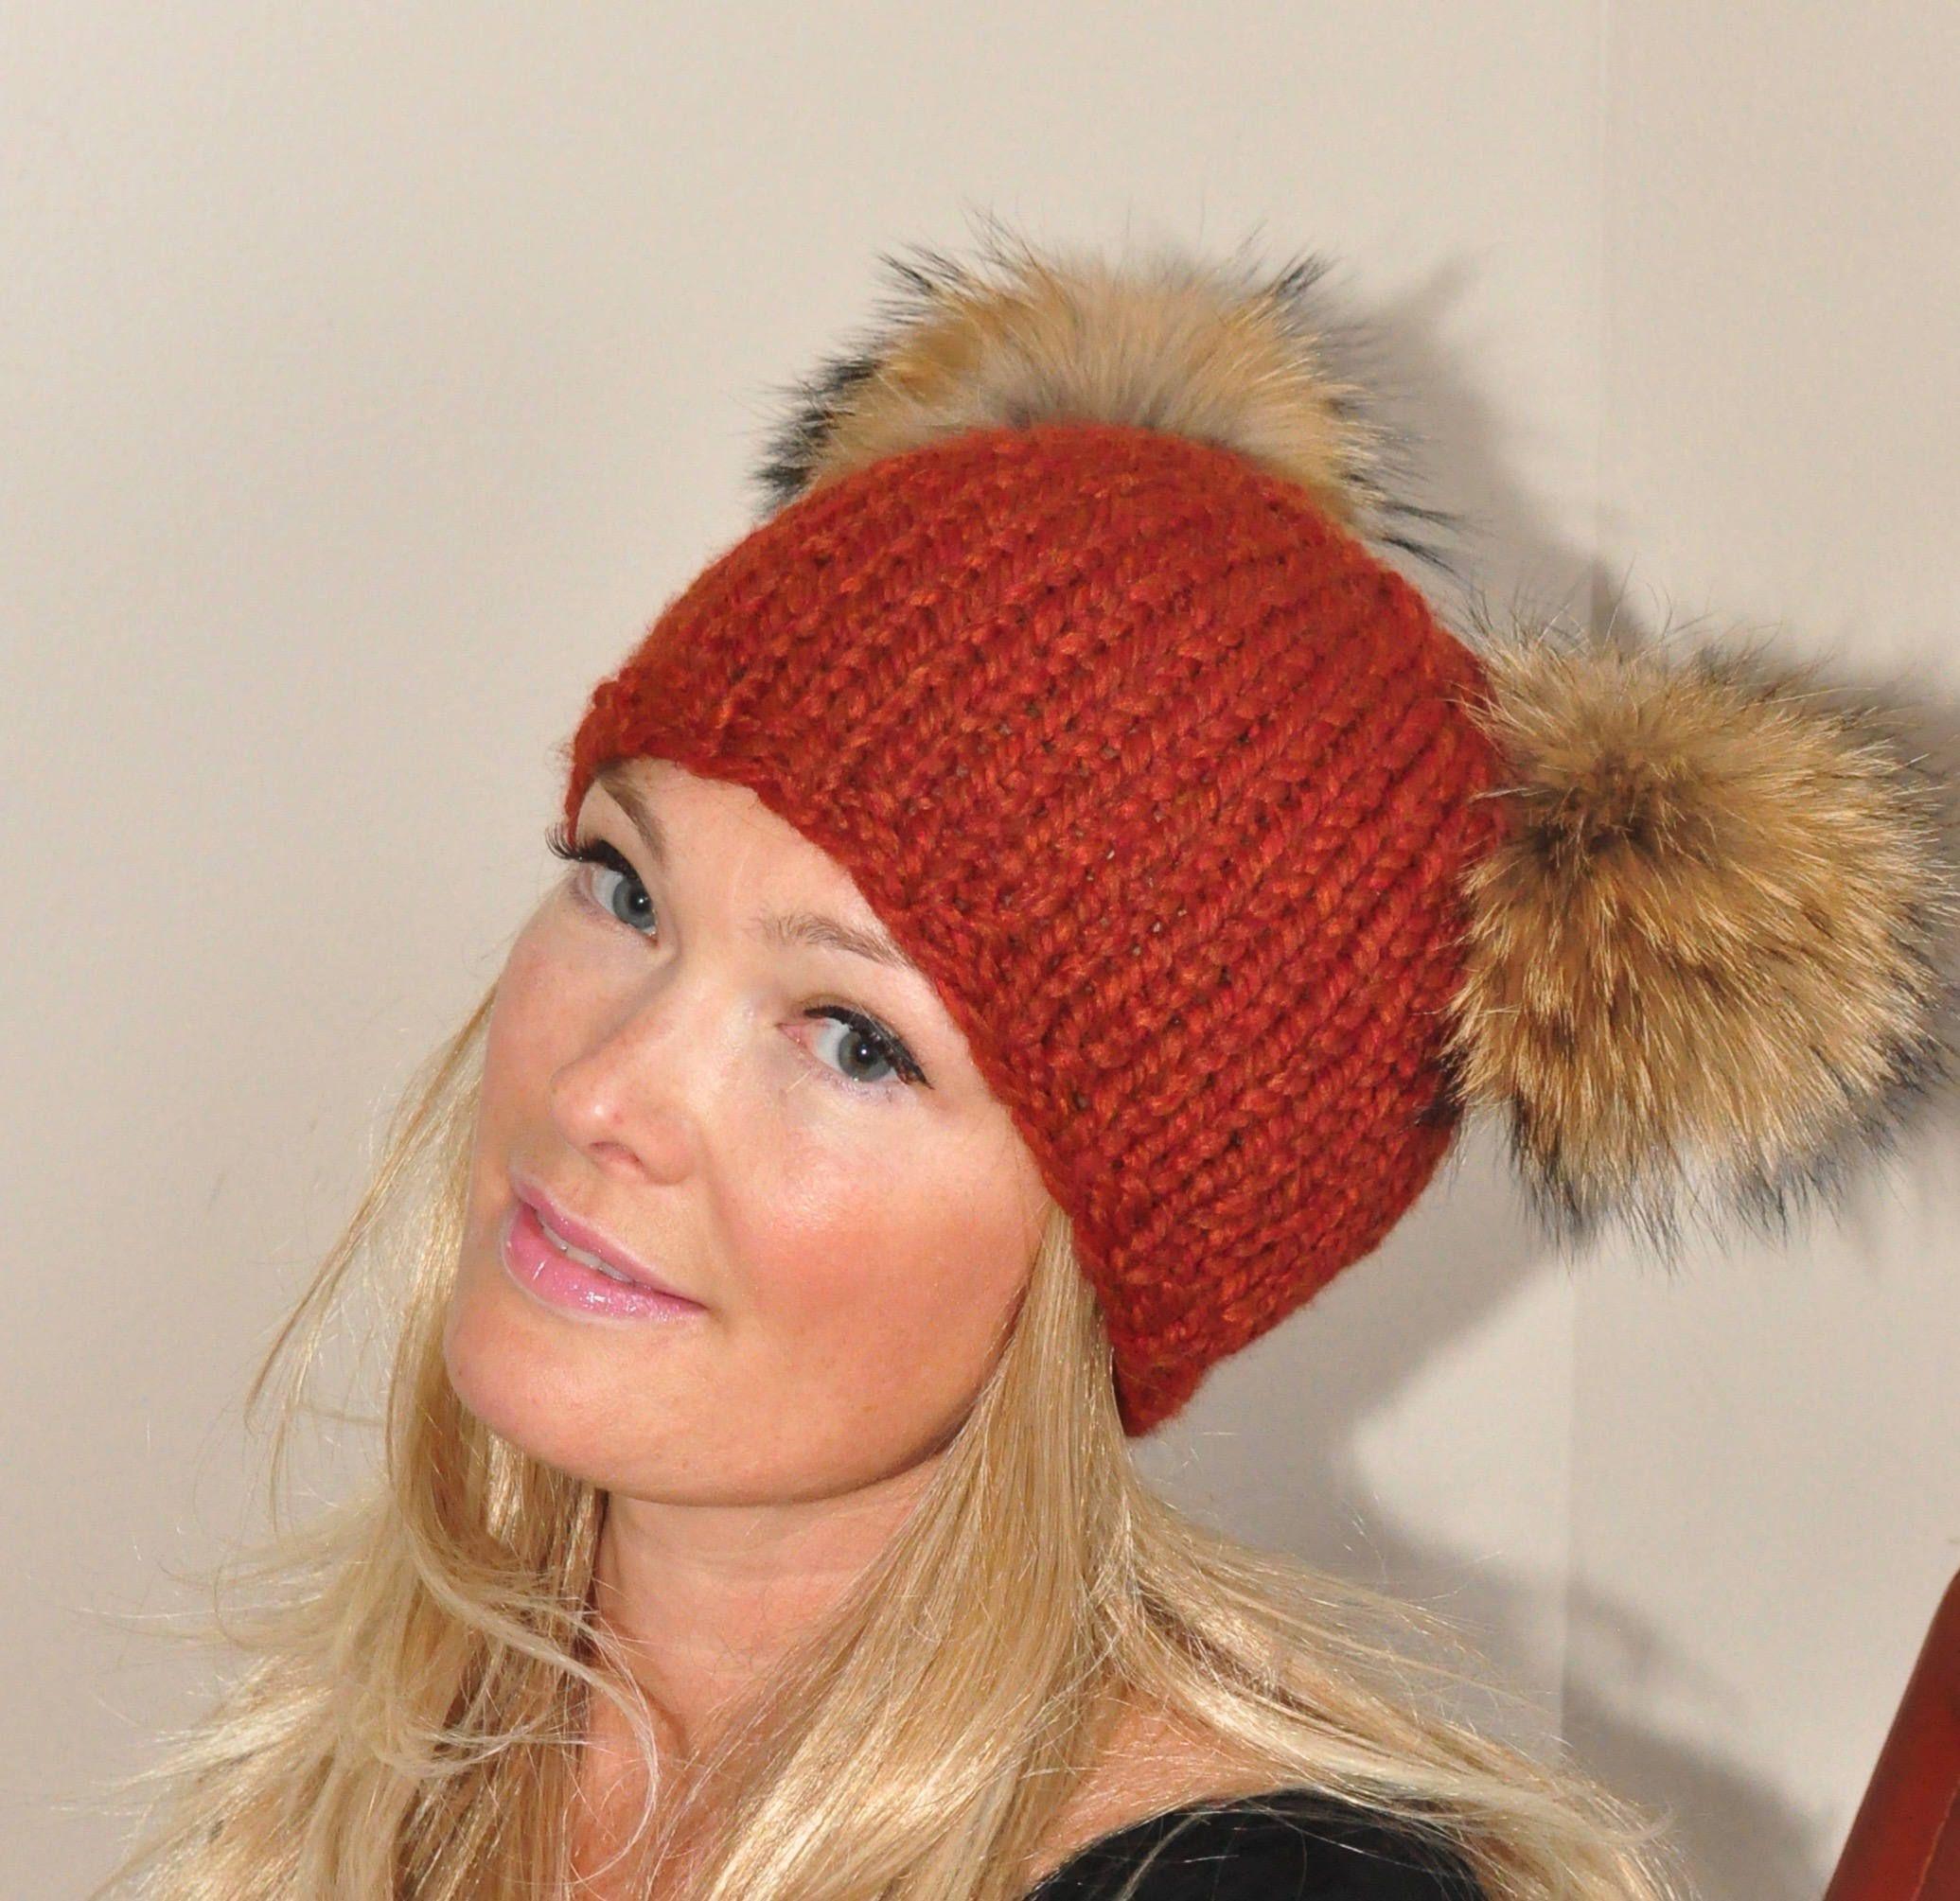 ffe28f01e31 Fur Pompom Beanie Kylie Jenner Hat 2 Fur Bobbles Hat CHOOSE COLOR Pumpkin  Spice Ski Women Hat Double Pompom Christmas Gift under 100 by lucymir on  Etsy